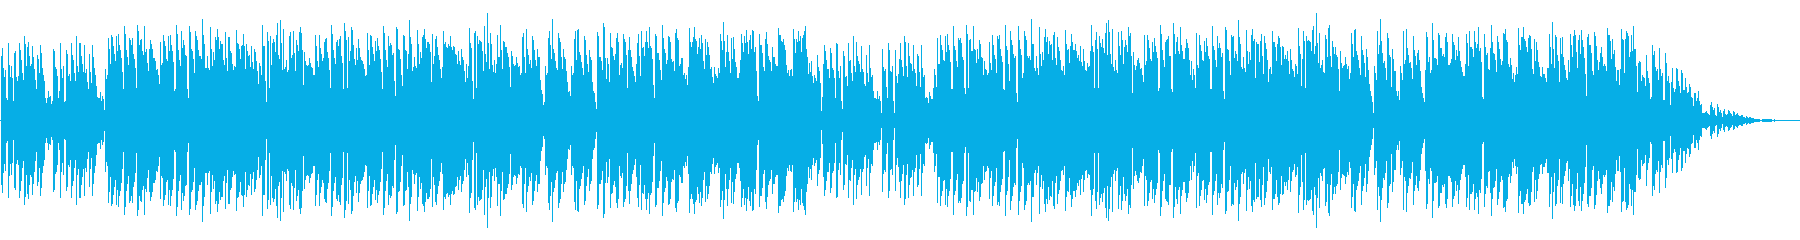 NES アクションD02-1(ステージ1の再生済みの波形